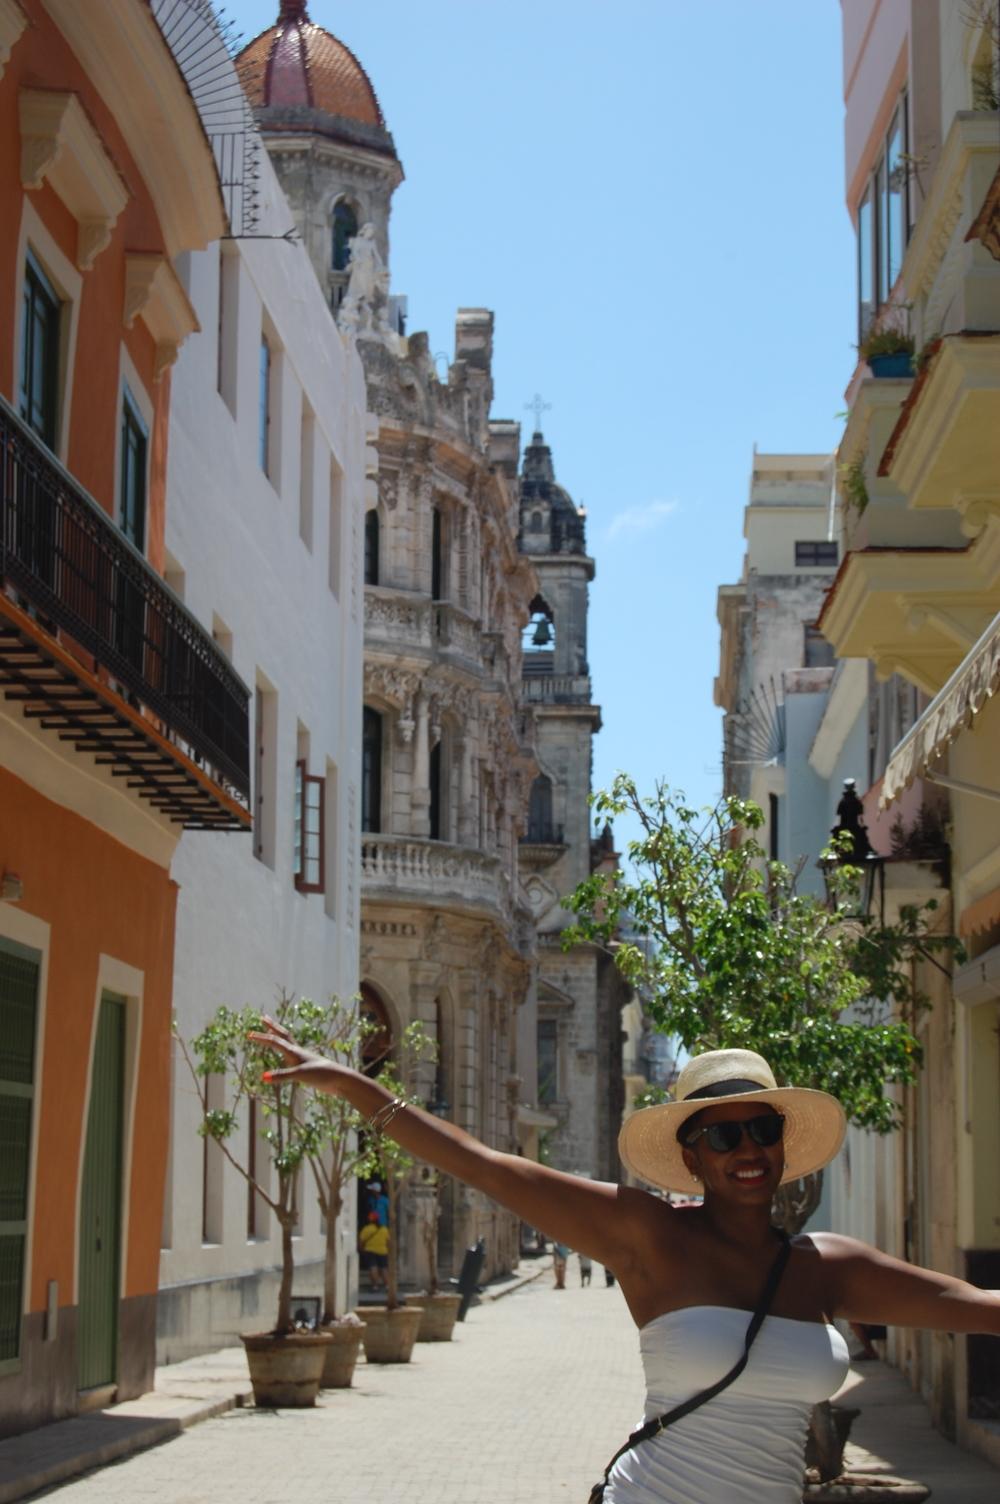 Cici on our trip to Havana